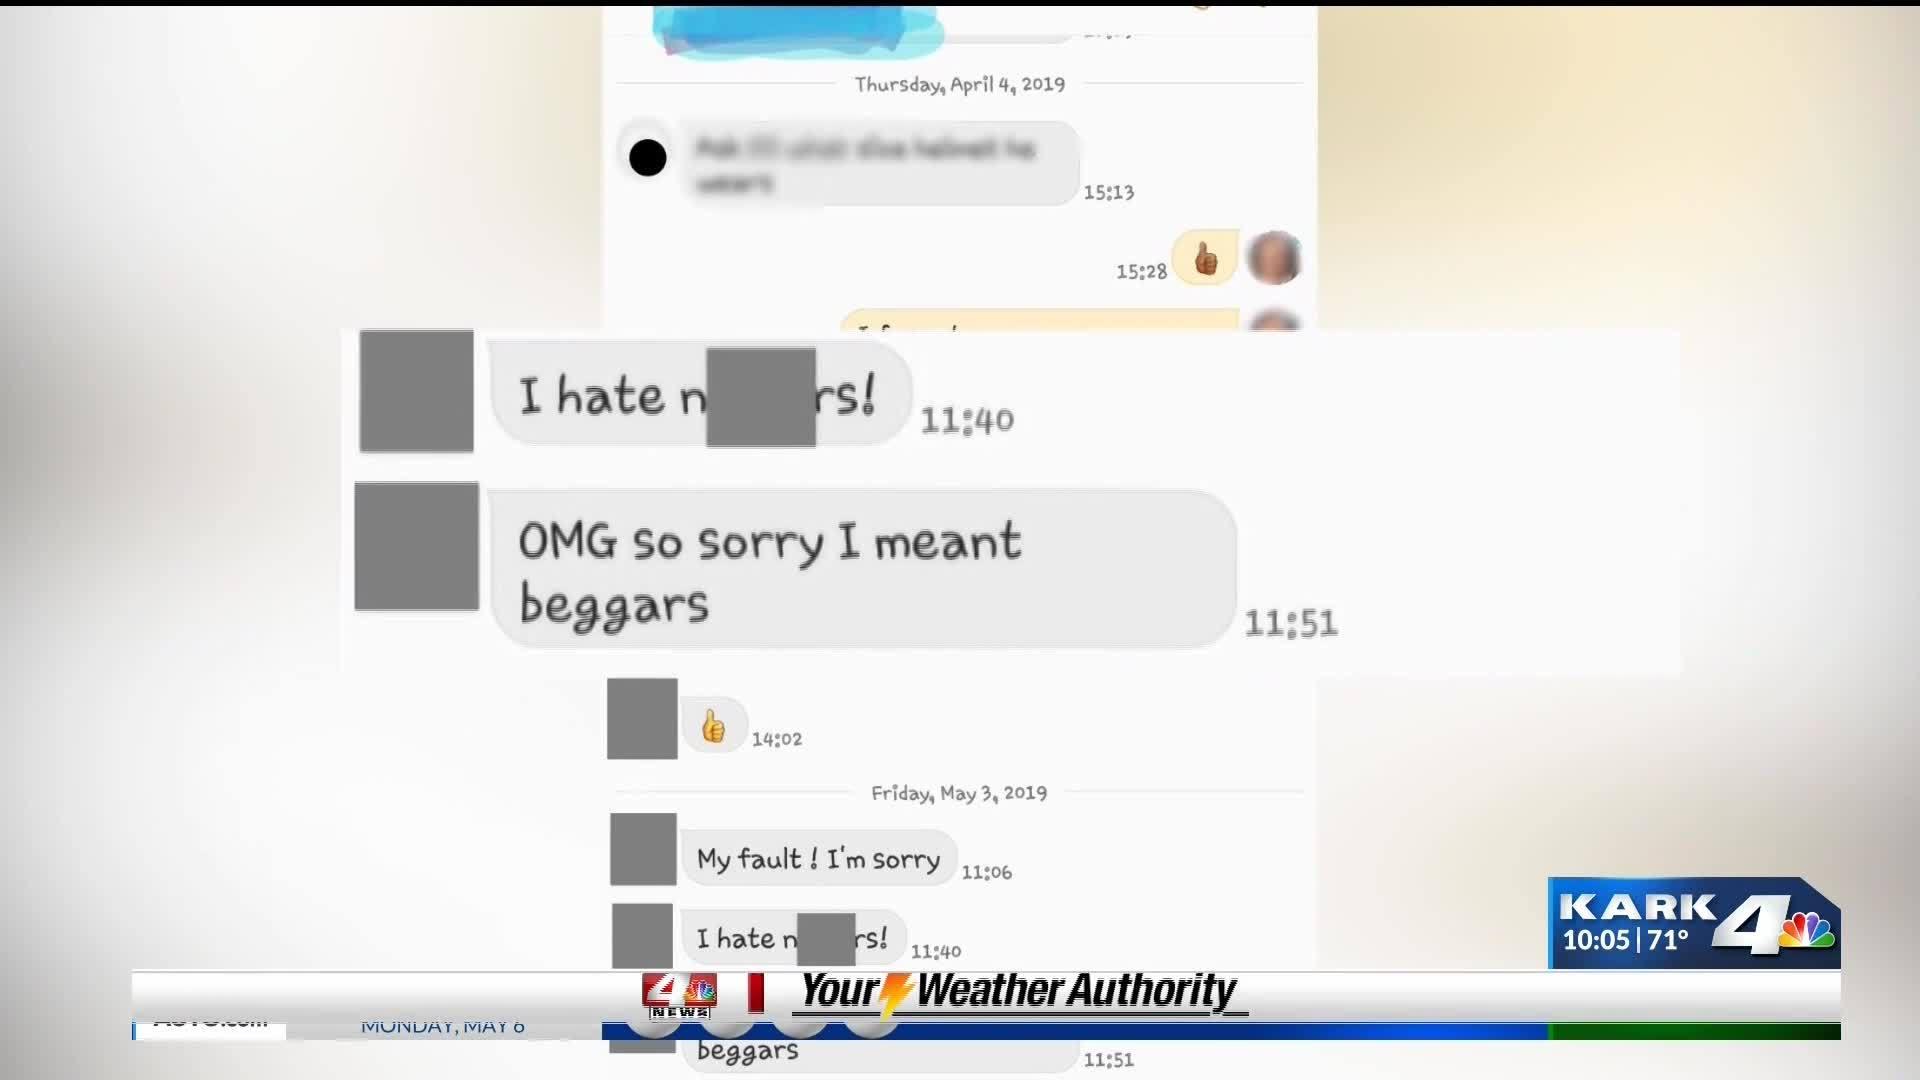 racist_text_message_sent_to_parent_8_20190507031720-118809306